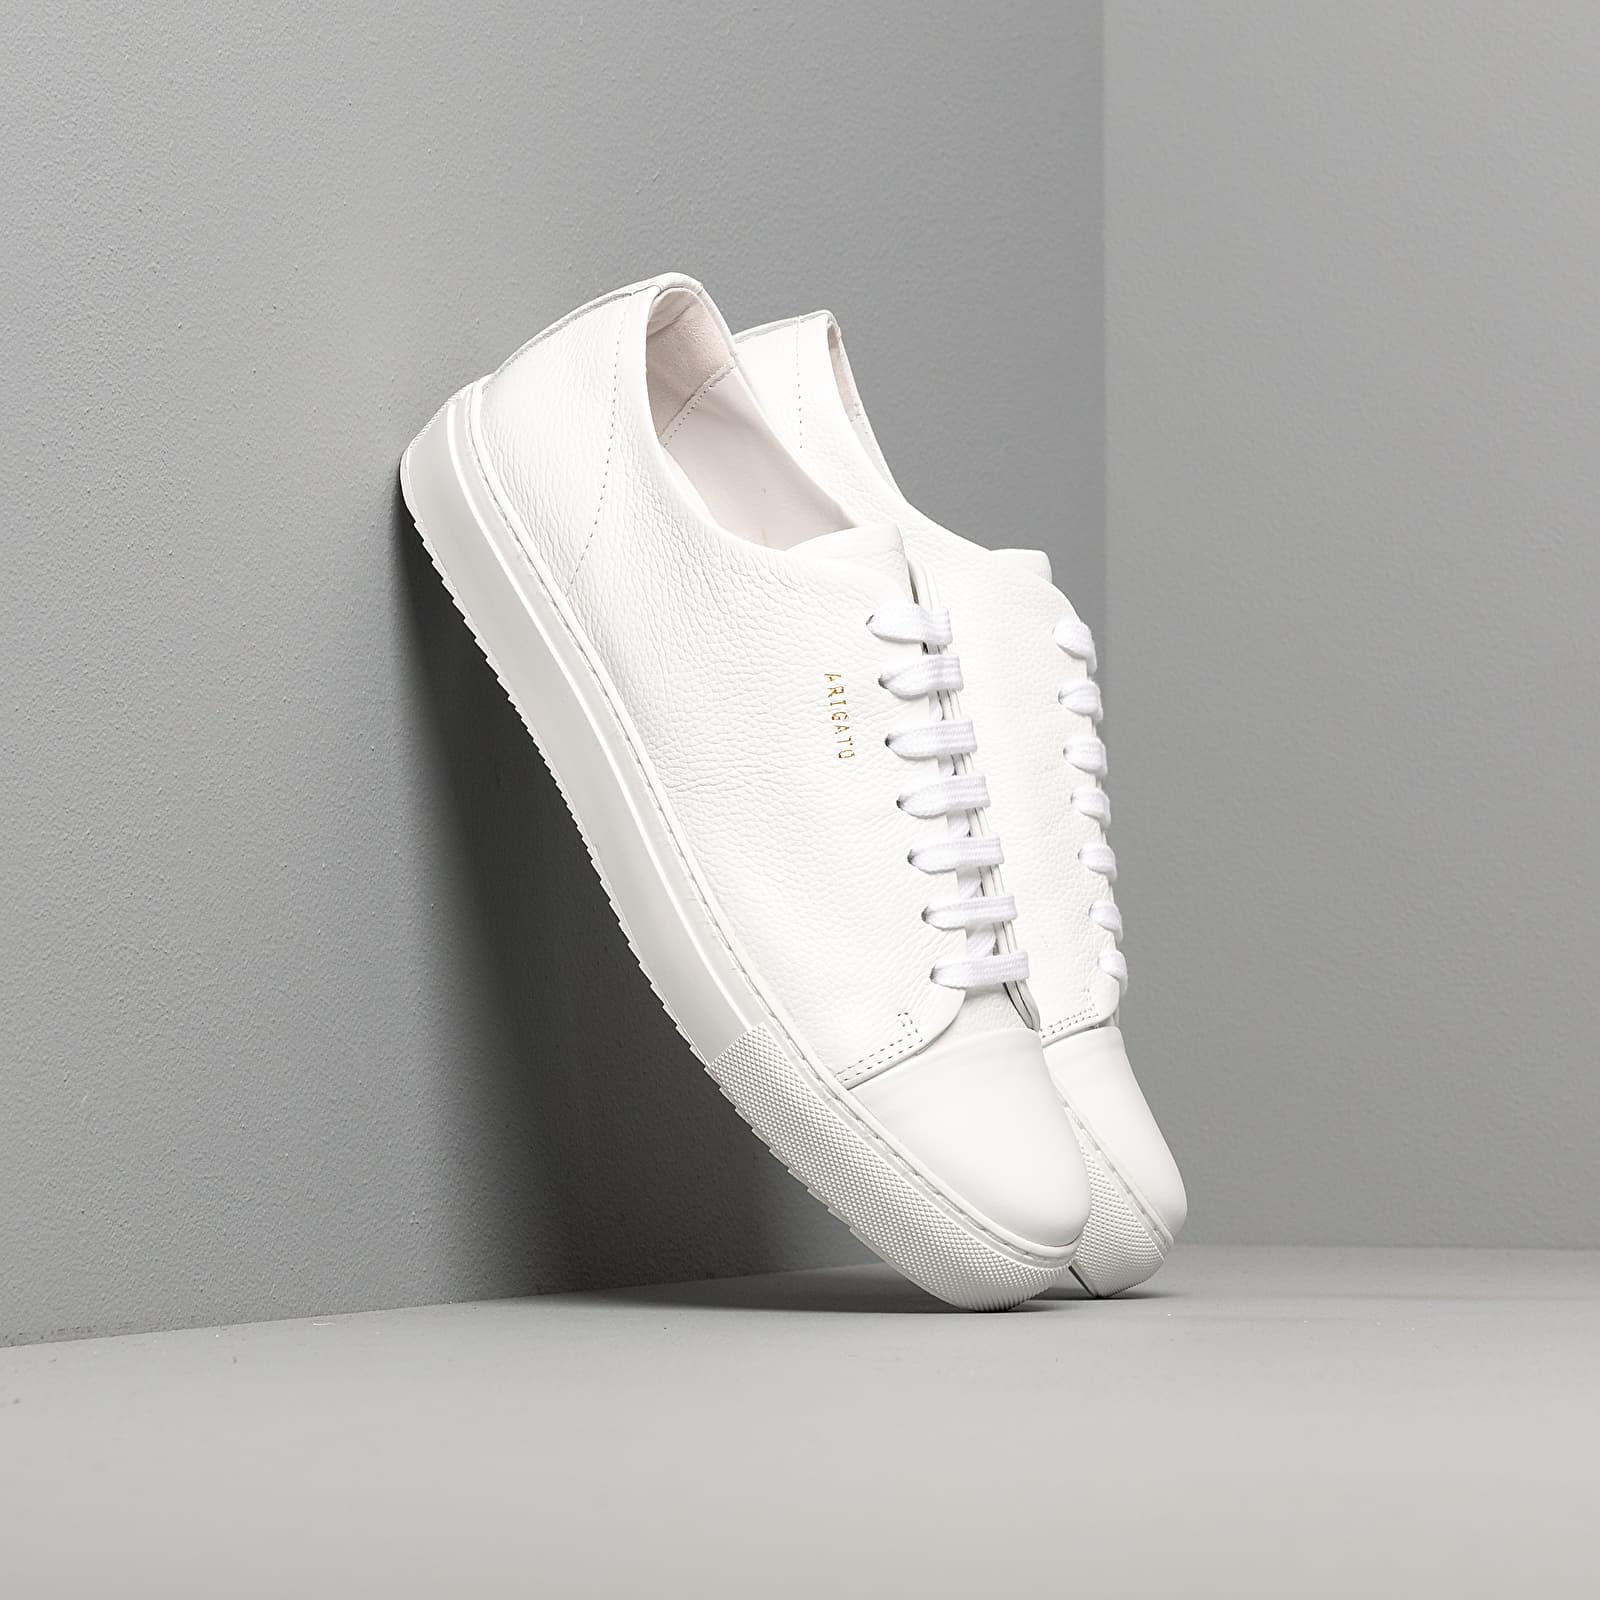 Men's shoes Axel Arigato Cap-toe White